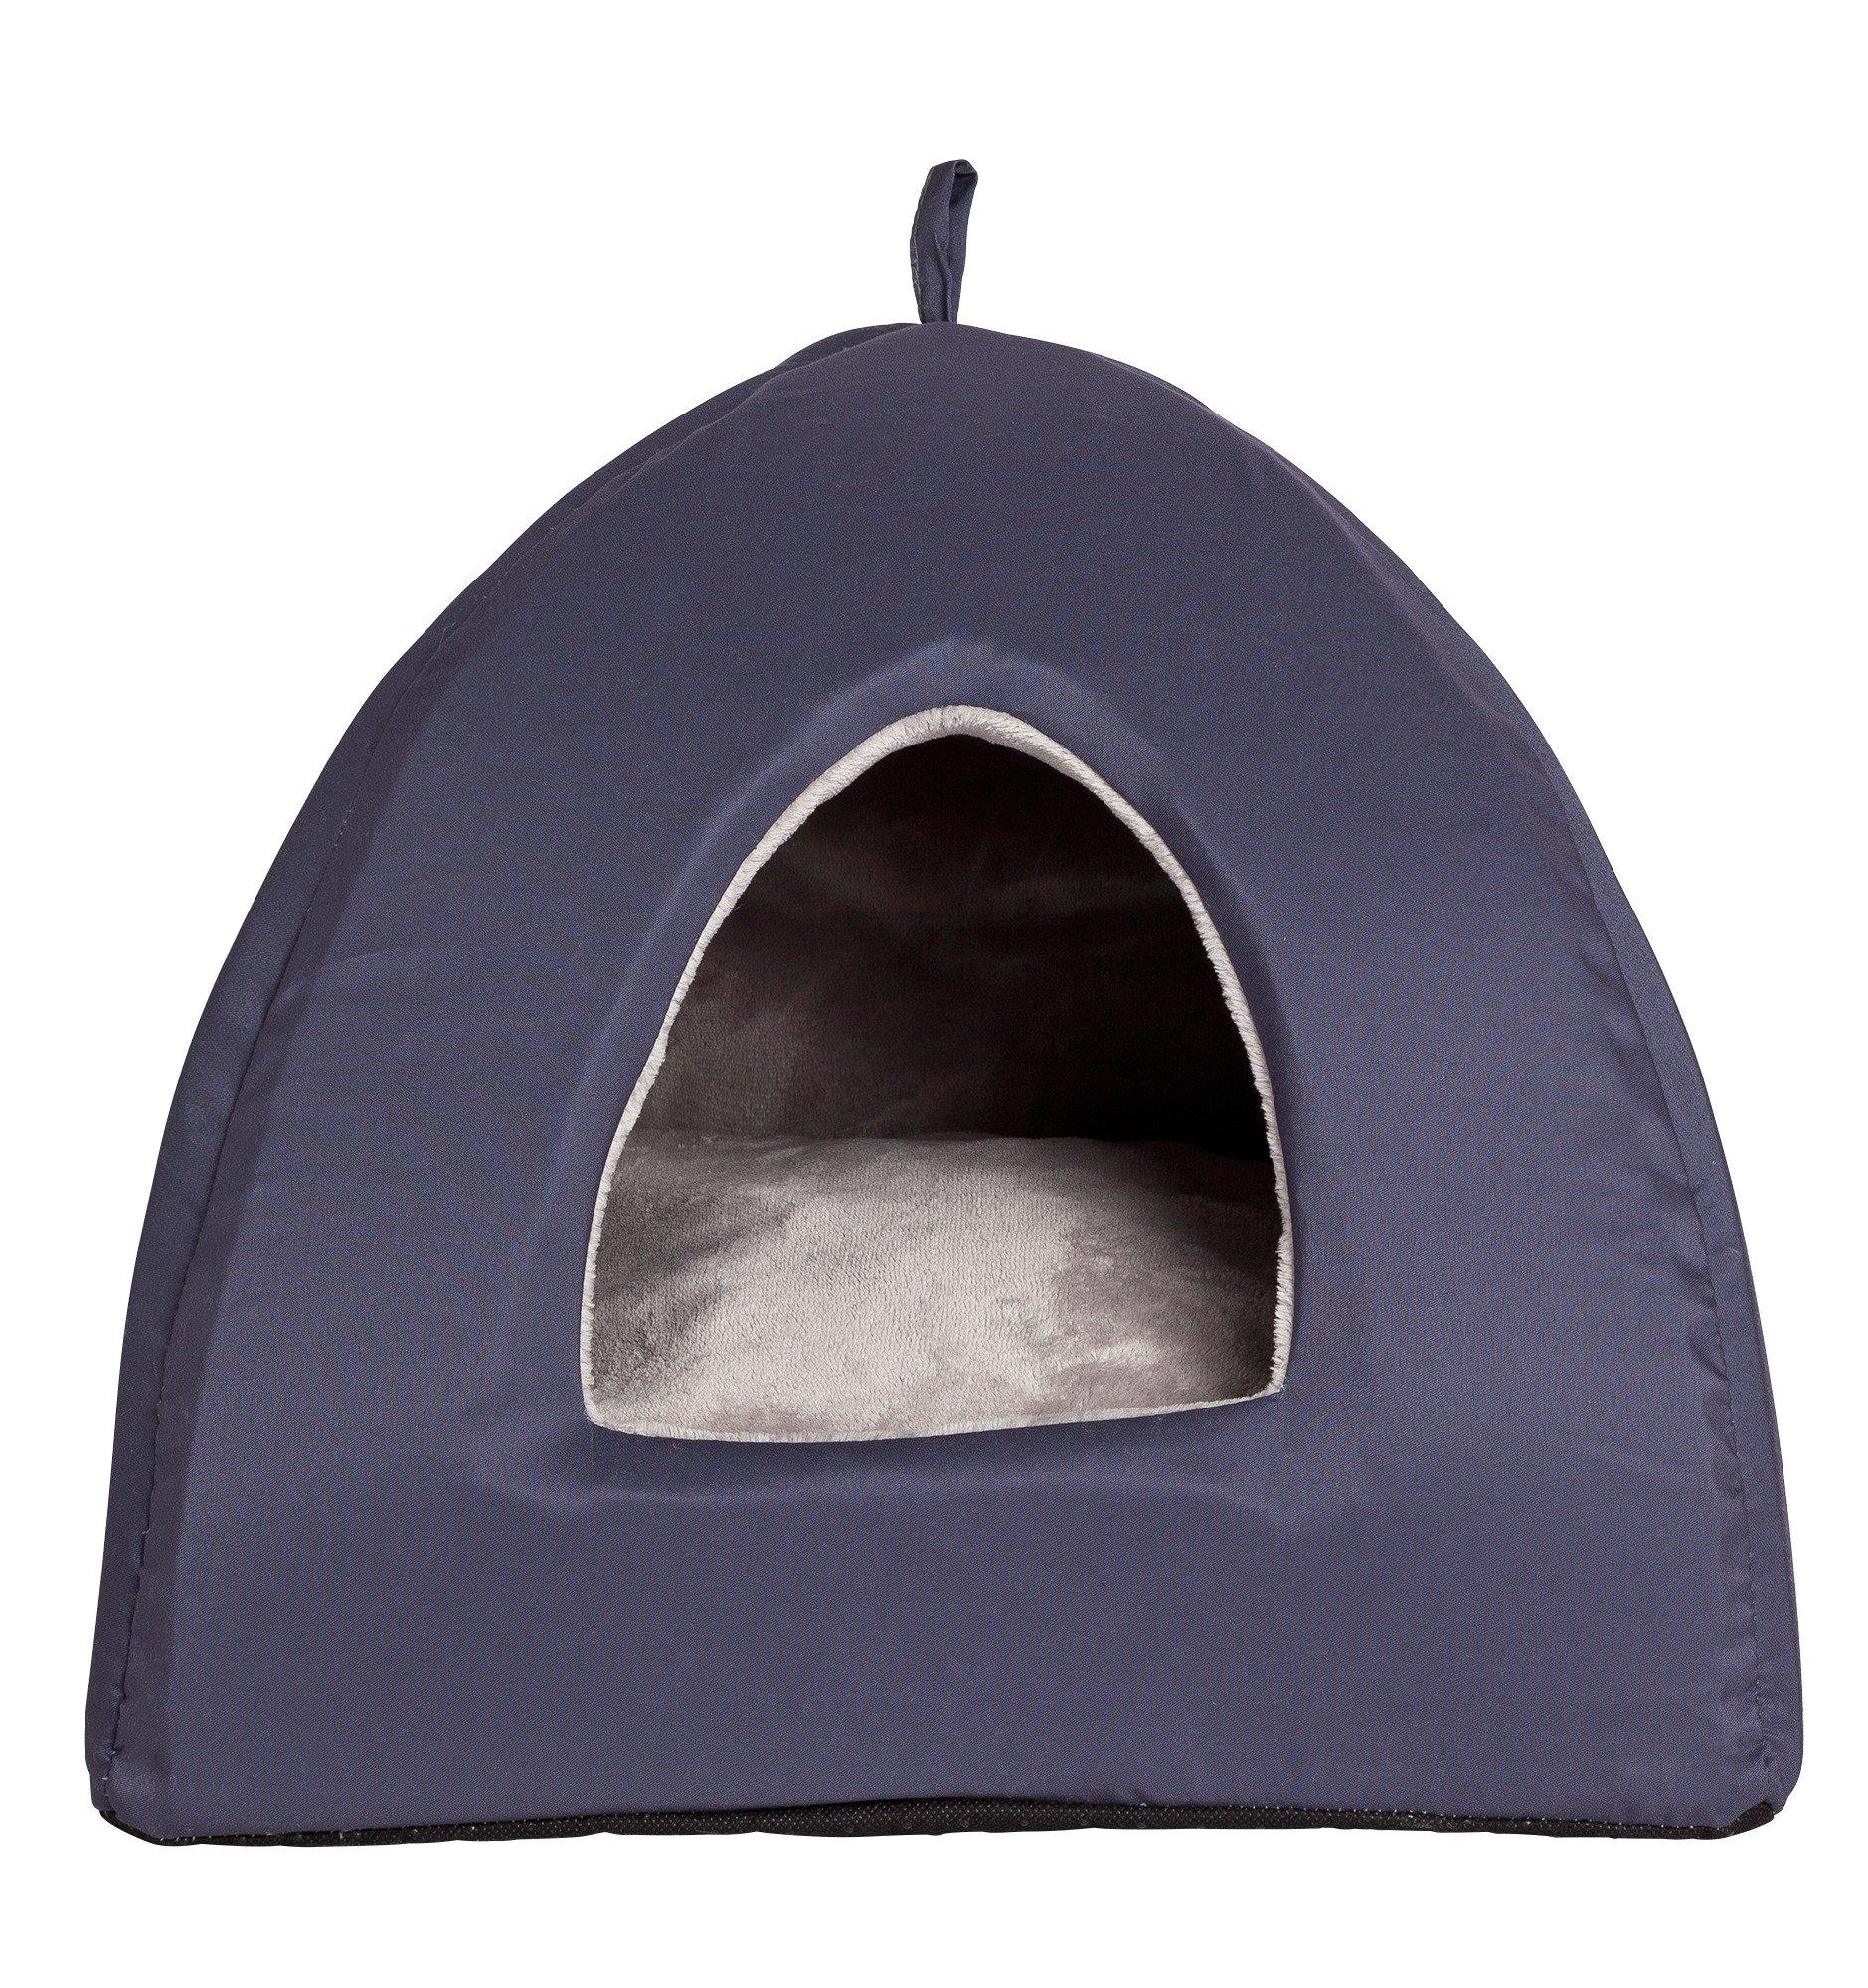 Classic Cat Igloo Bed